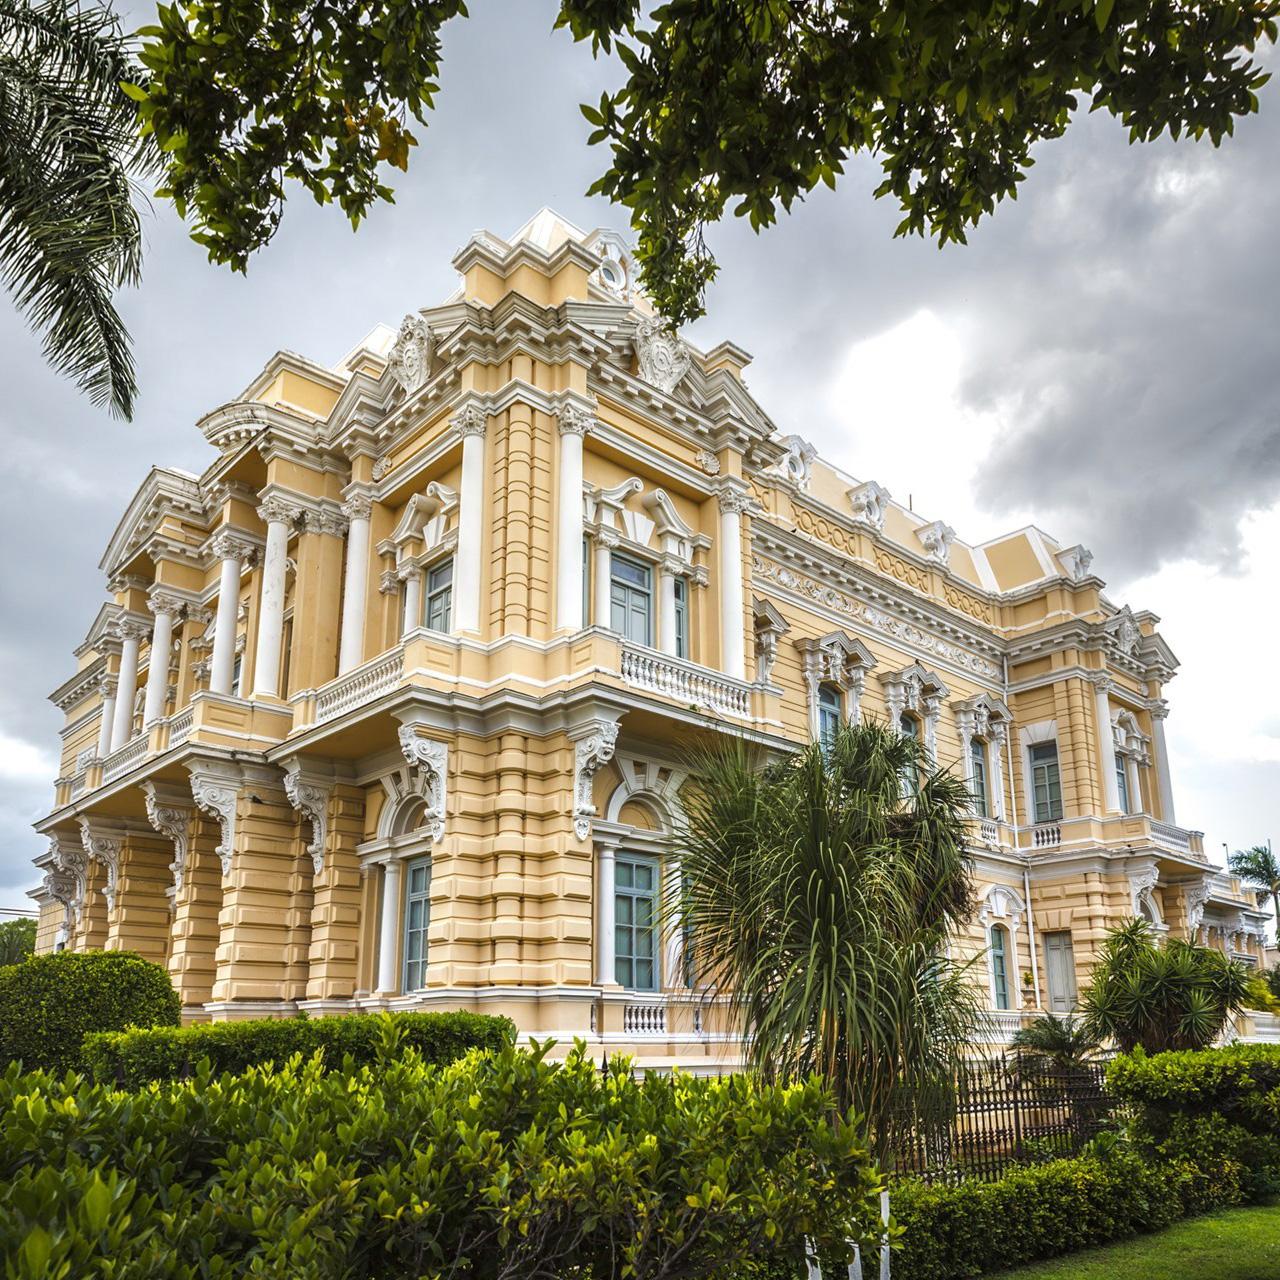 Foto Palacio Cantón en Mérida Yucatán